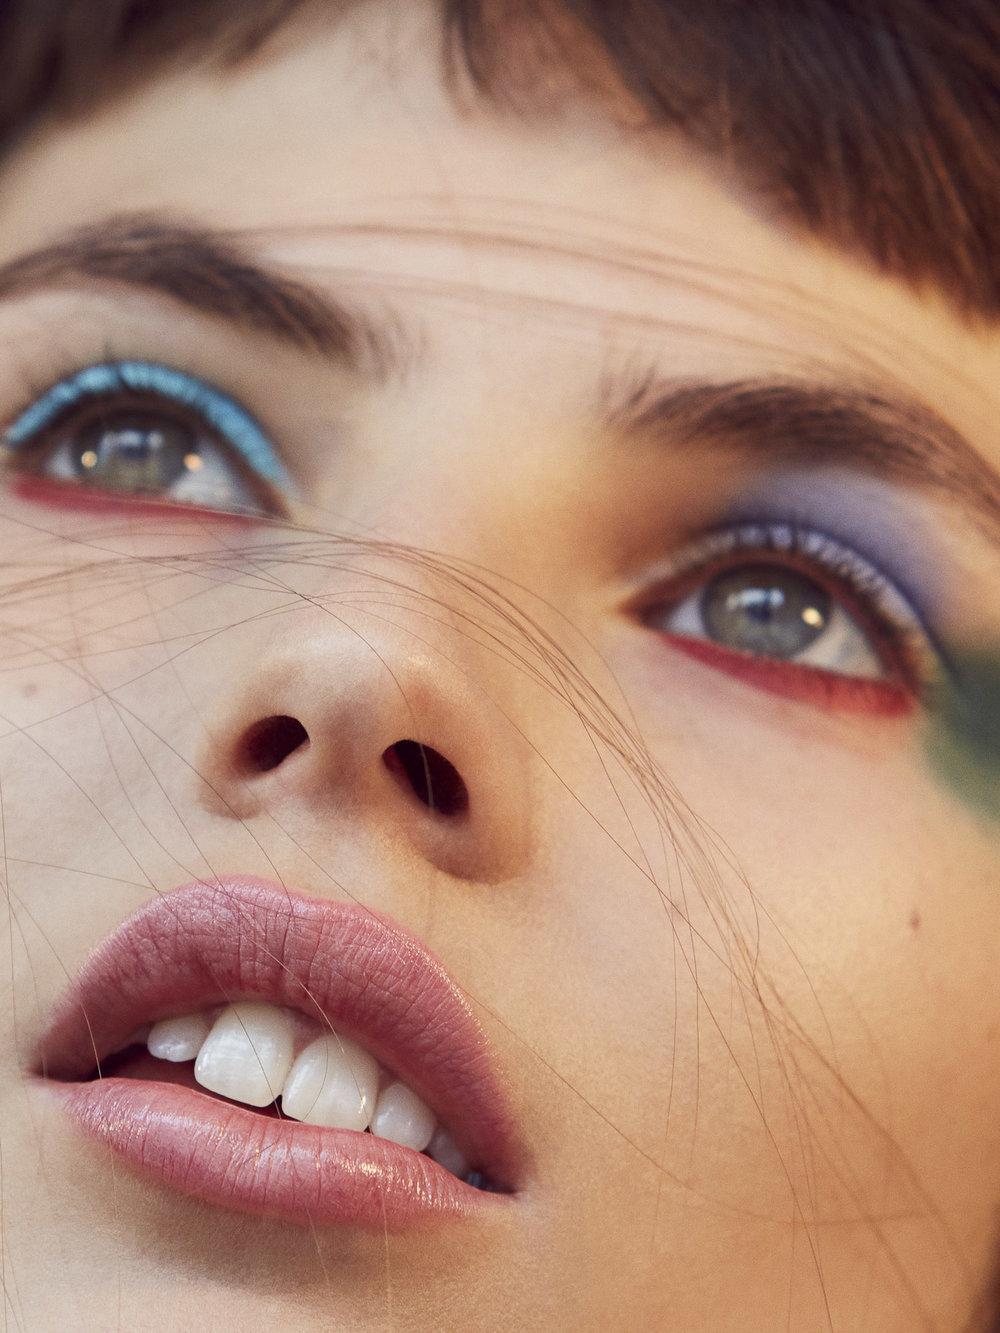 Jungle Red lipstick on lower eyelid